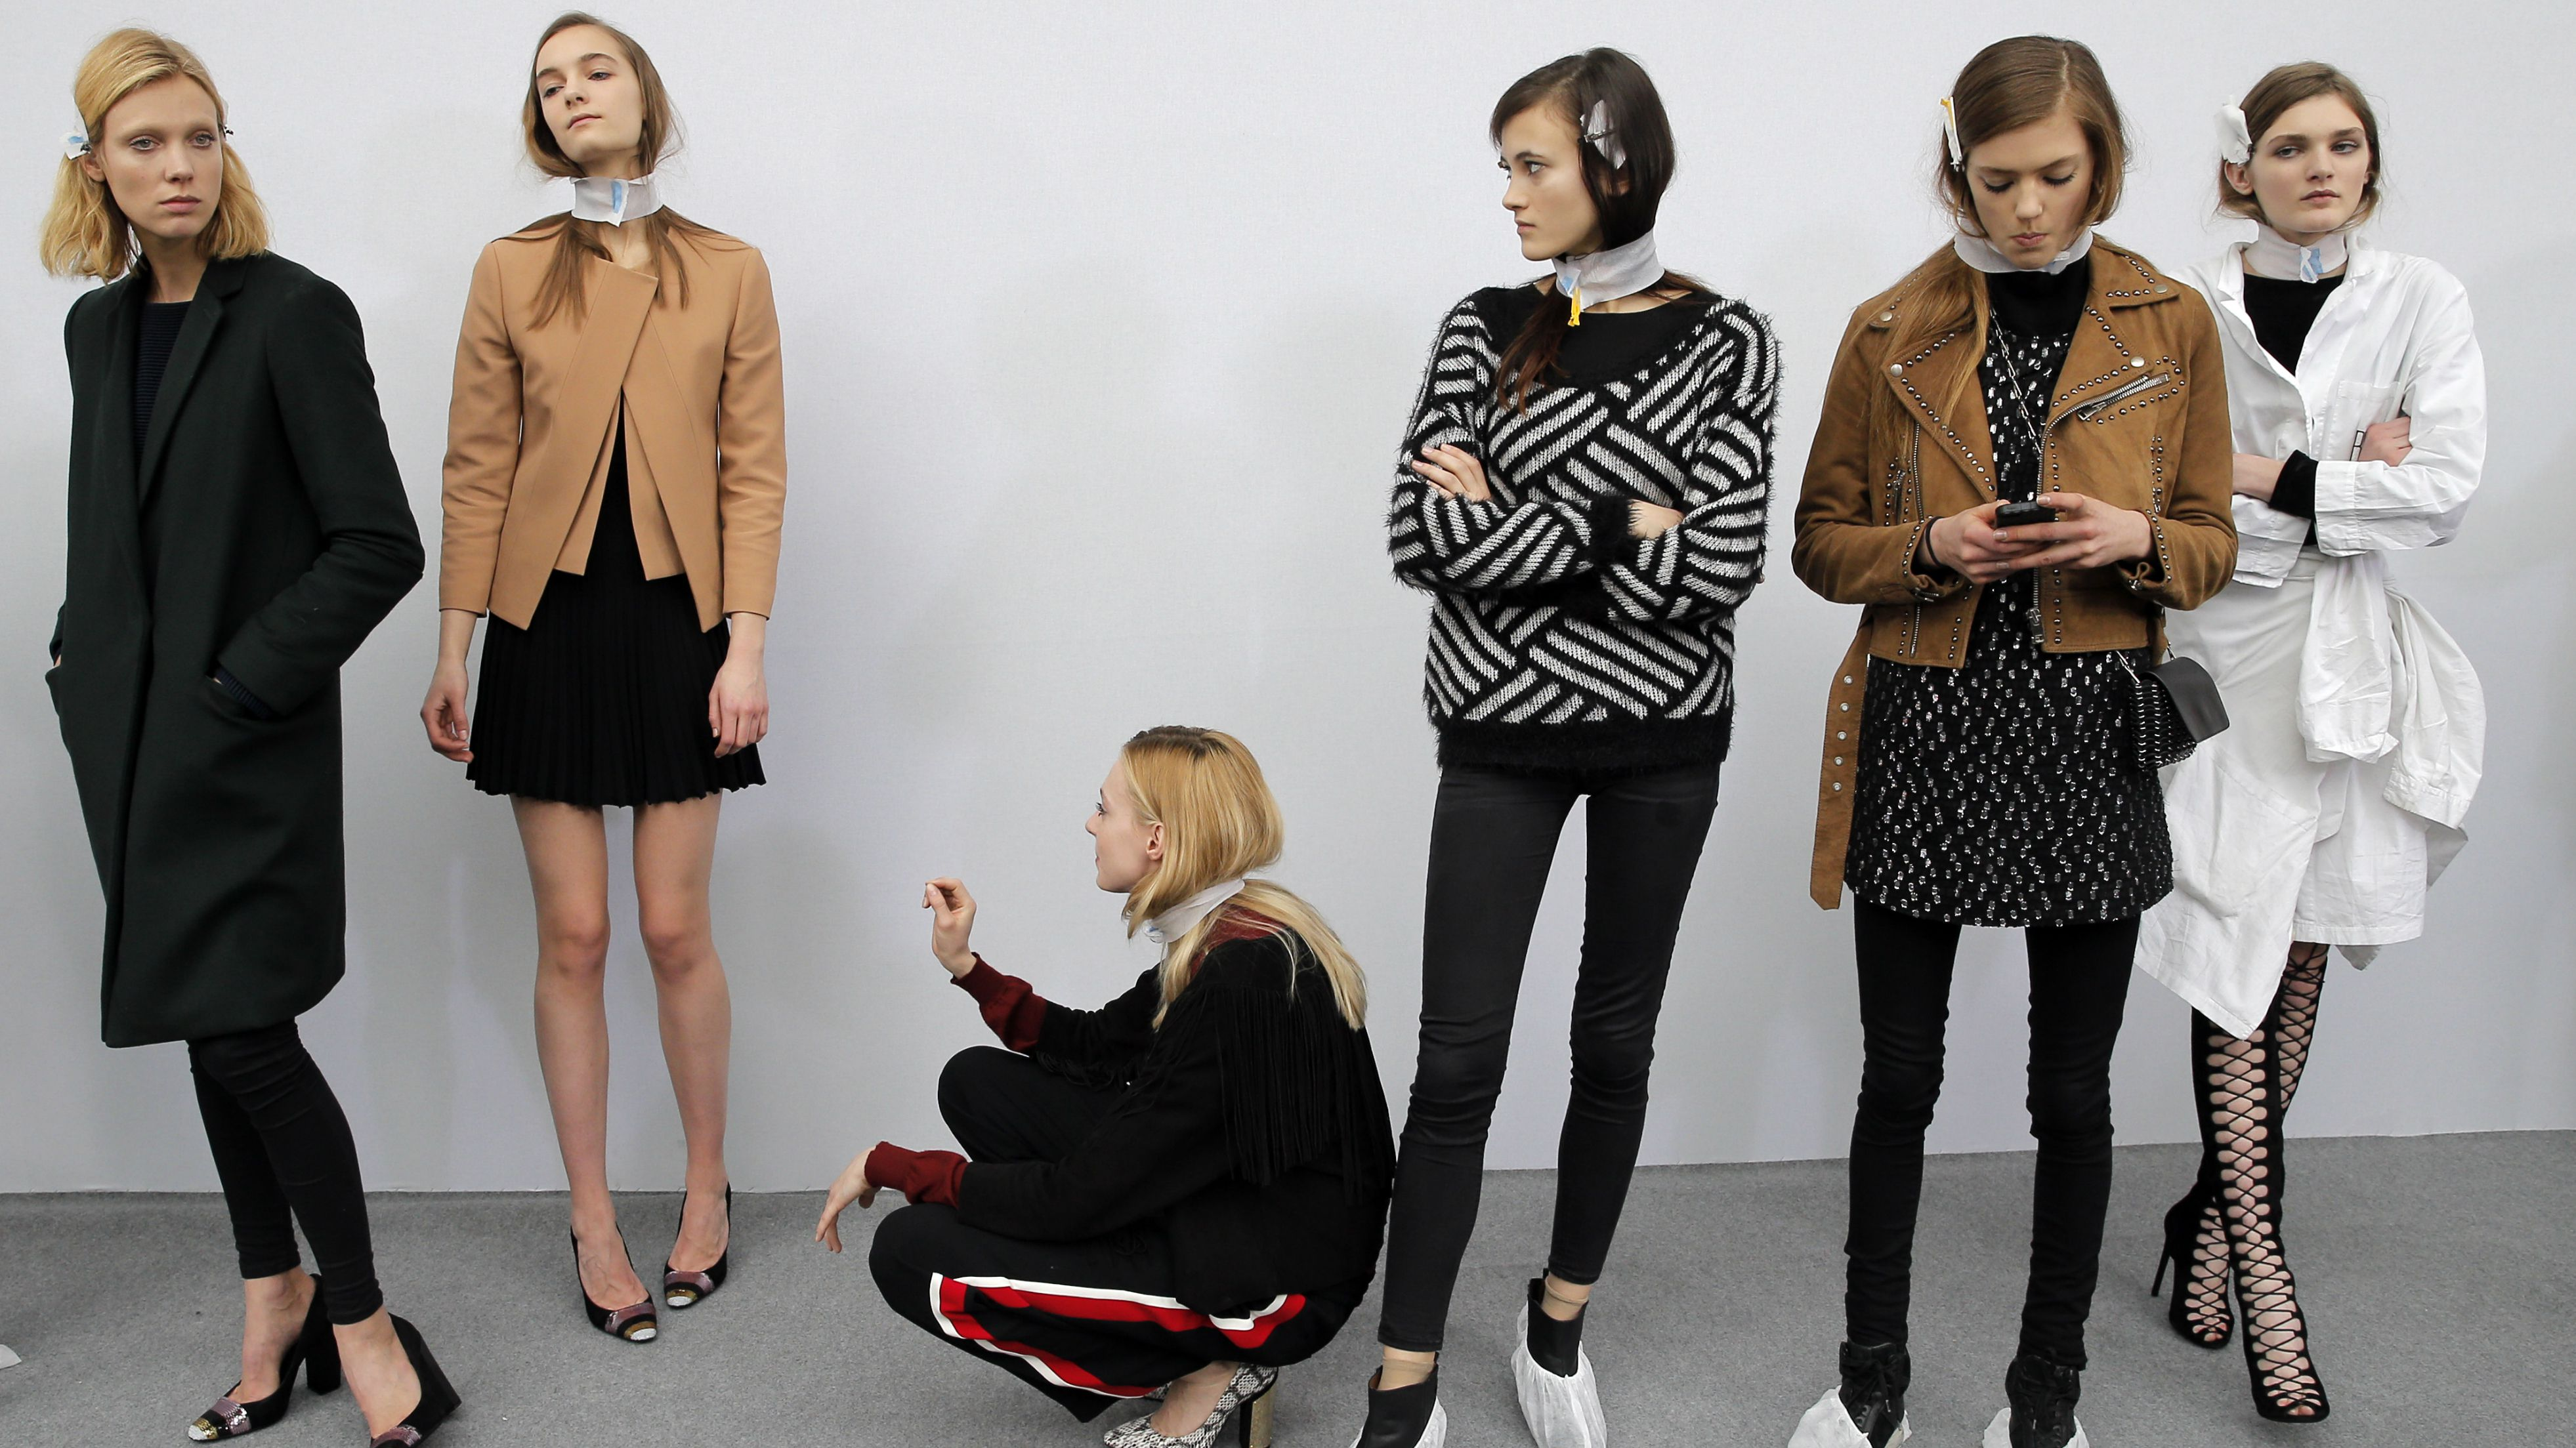 skinny models, paris, fashion week, france, model ban, eating disorders, anorexia